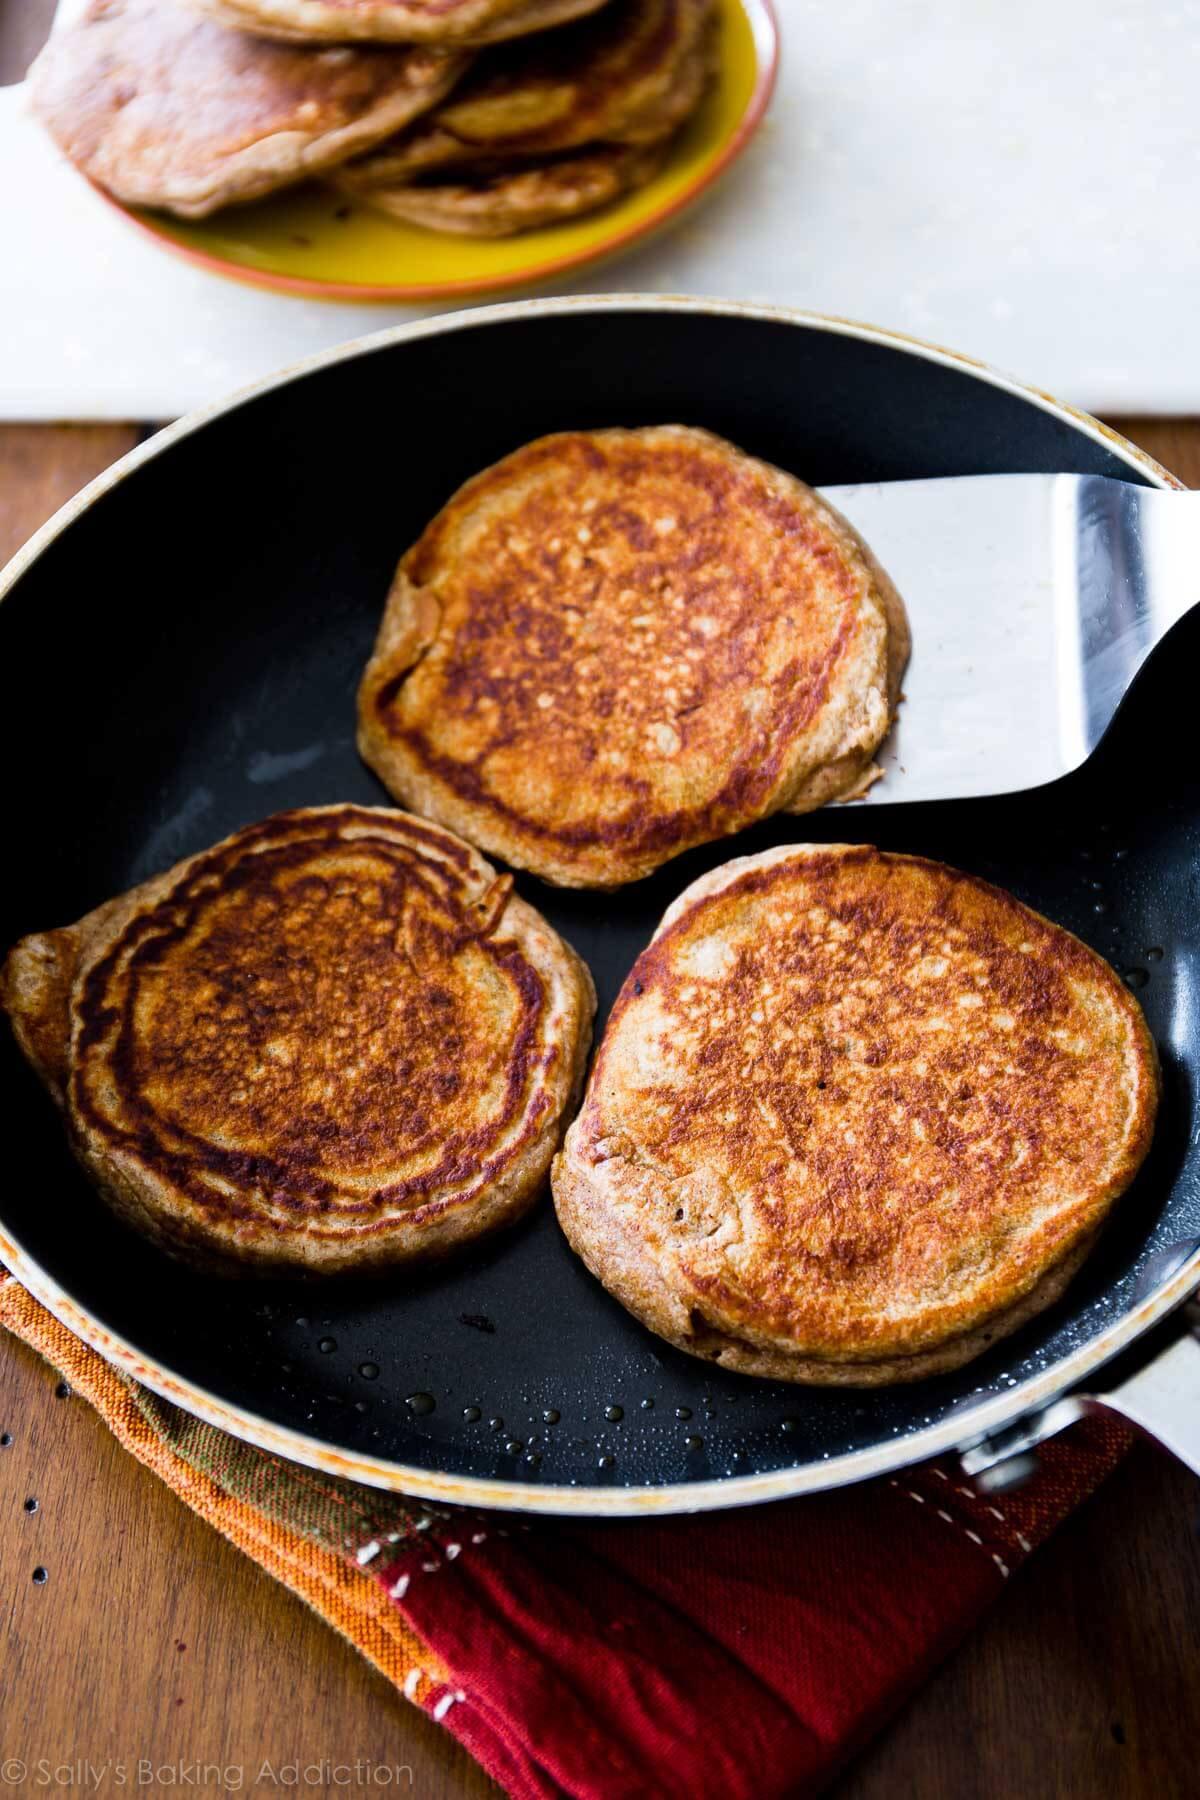 Healthy Banana Pancakes  Whole Wheat Banana Pancakes Sallys Baking Addiction